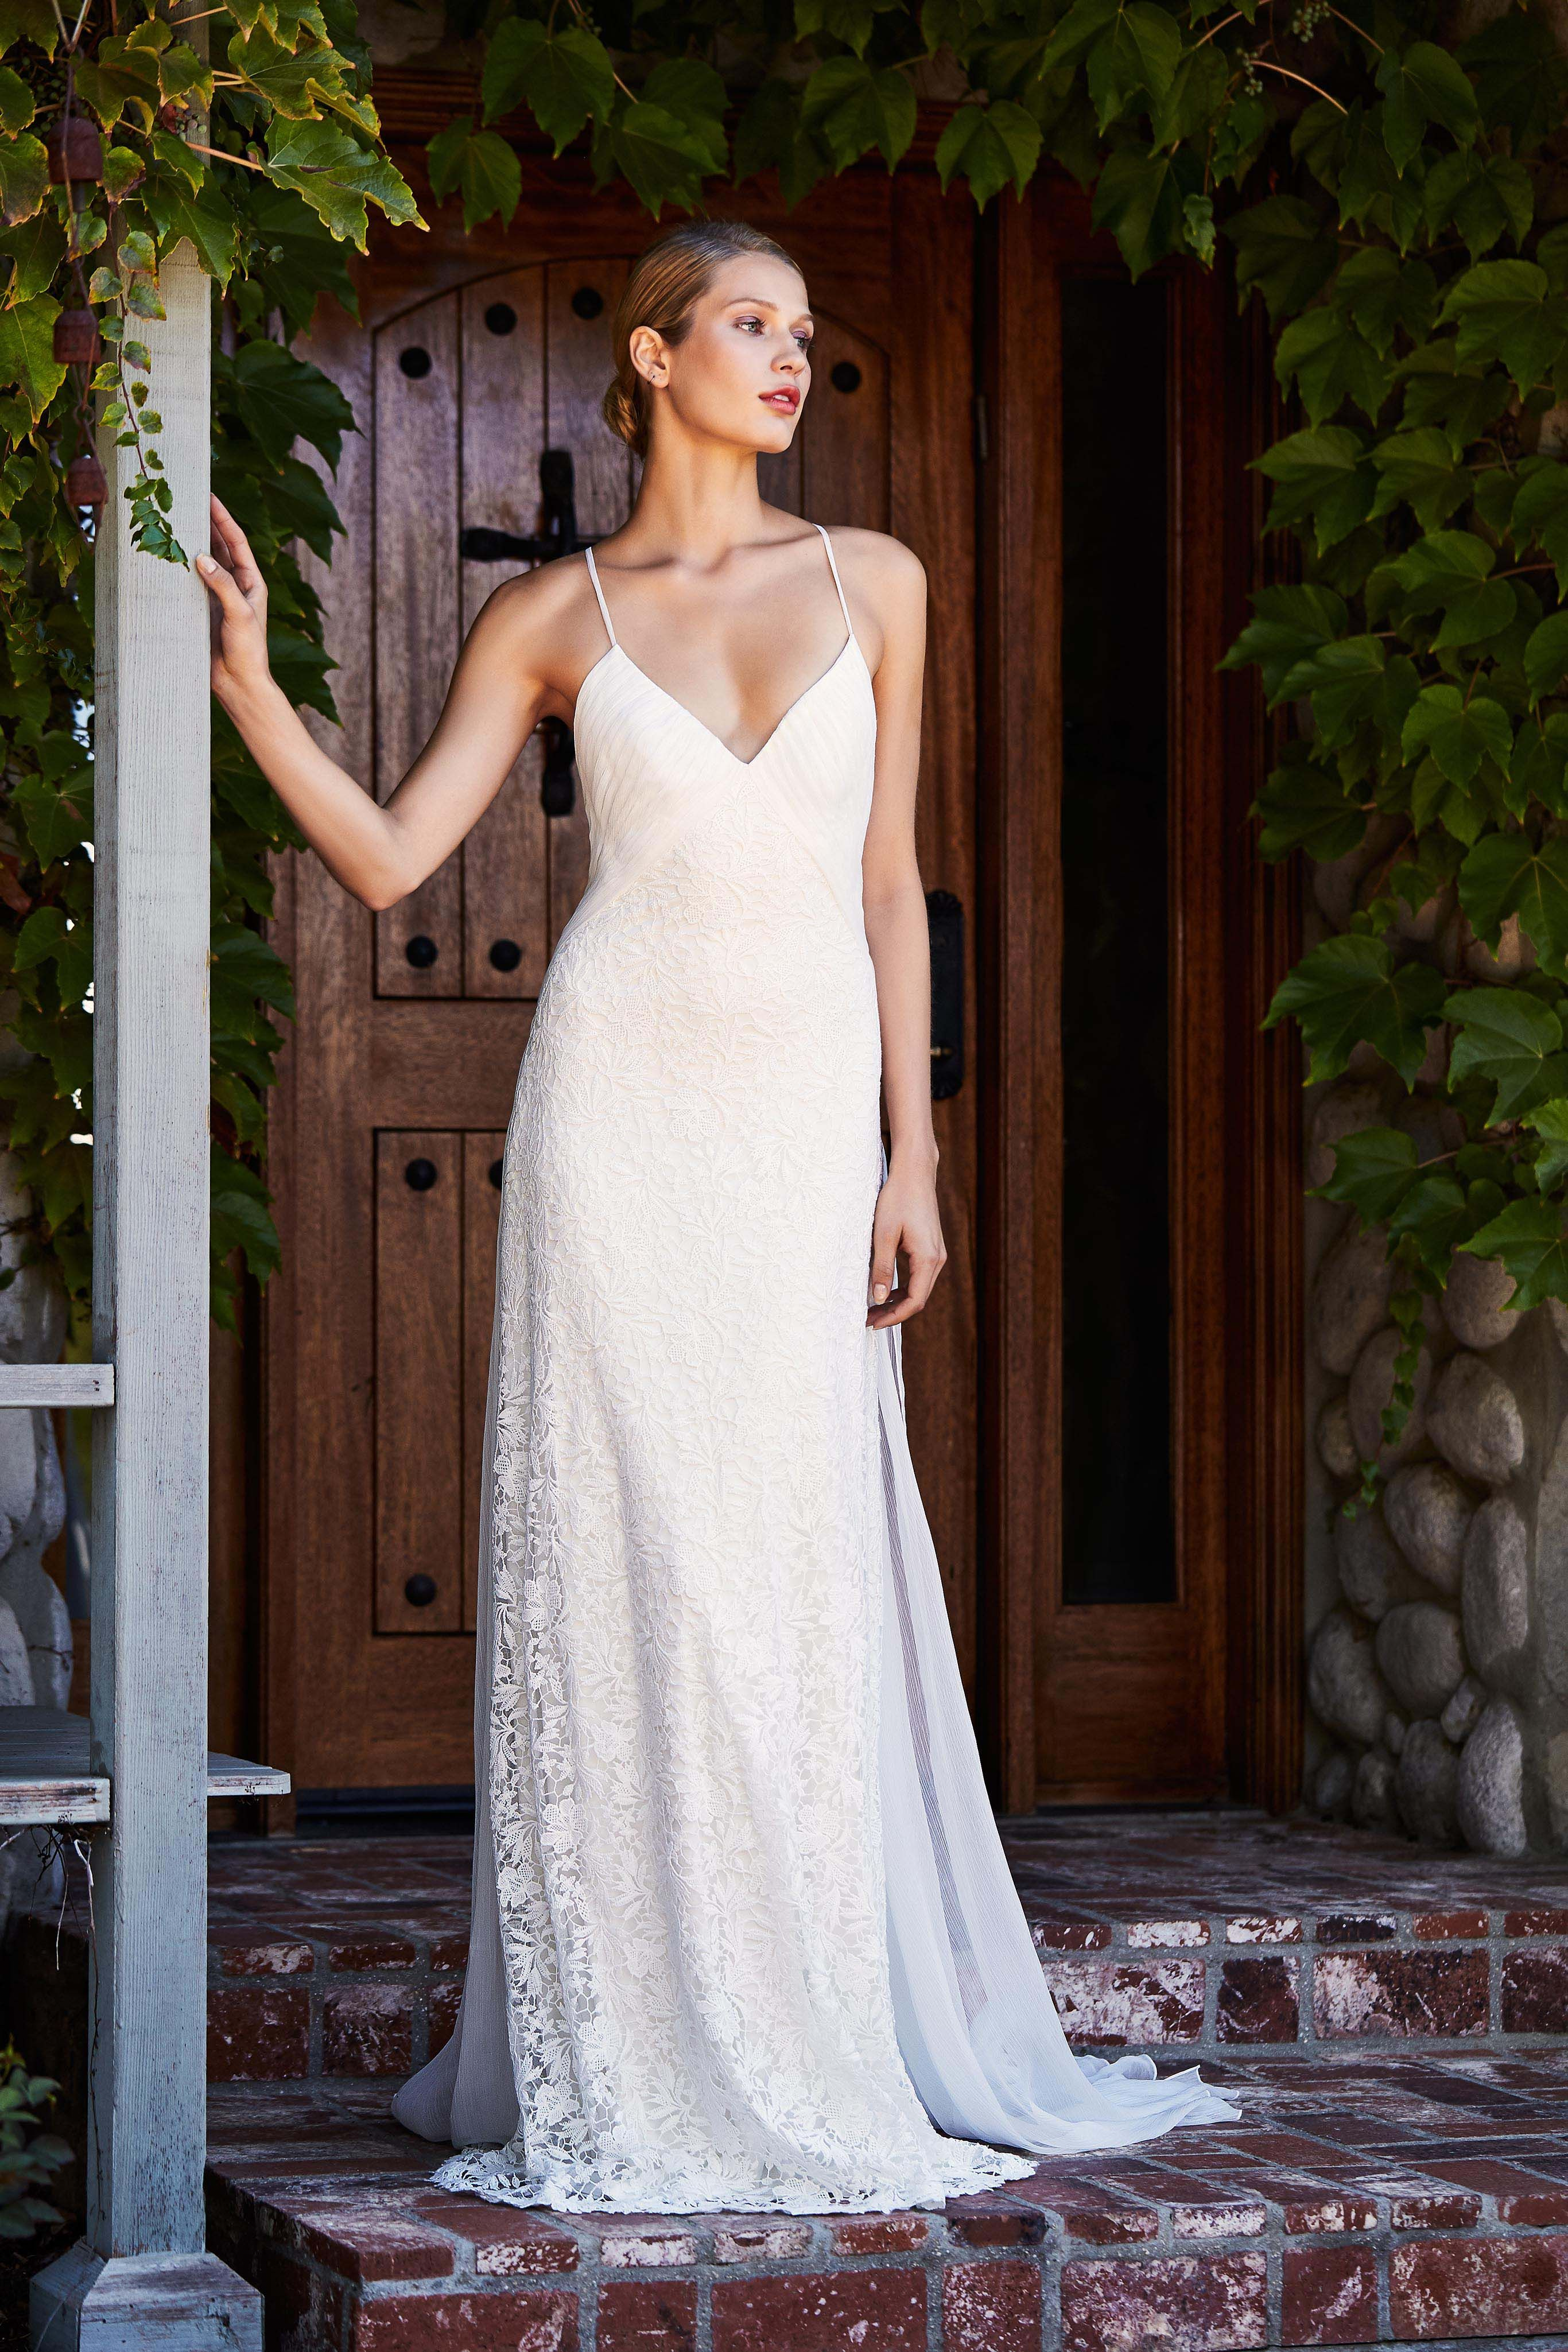 simple wedding dresses,wedding dresses simple,